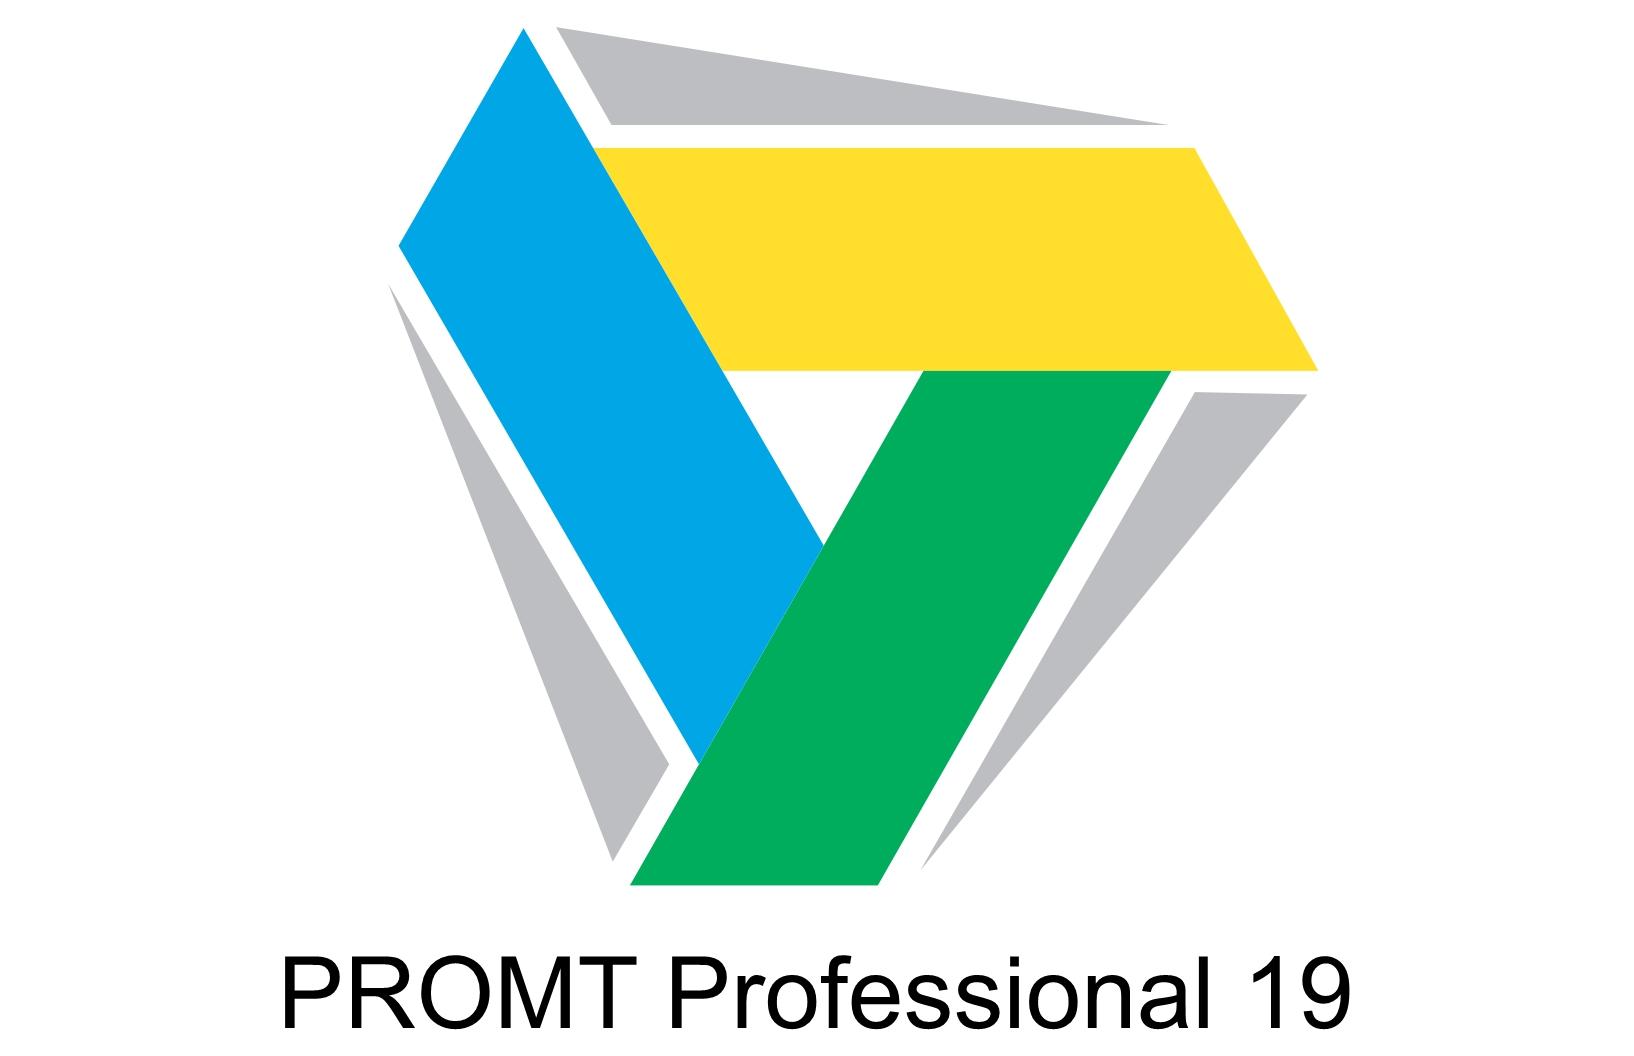 PROMT Professional 19